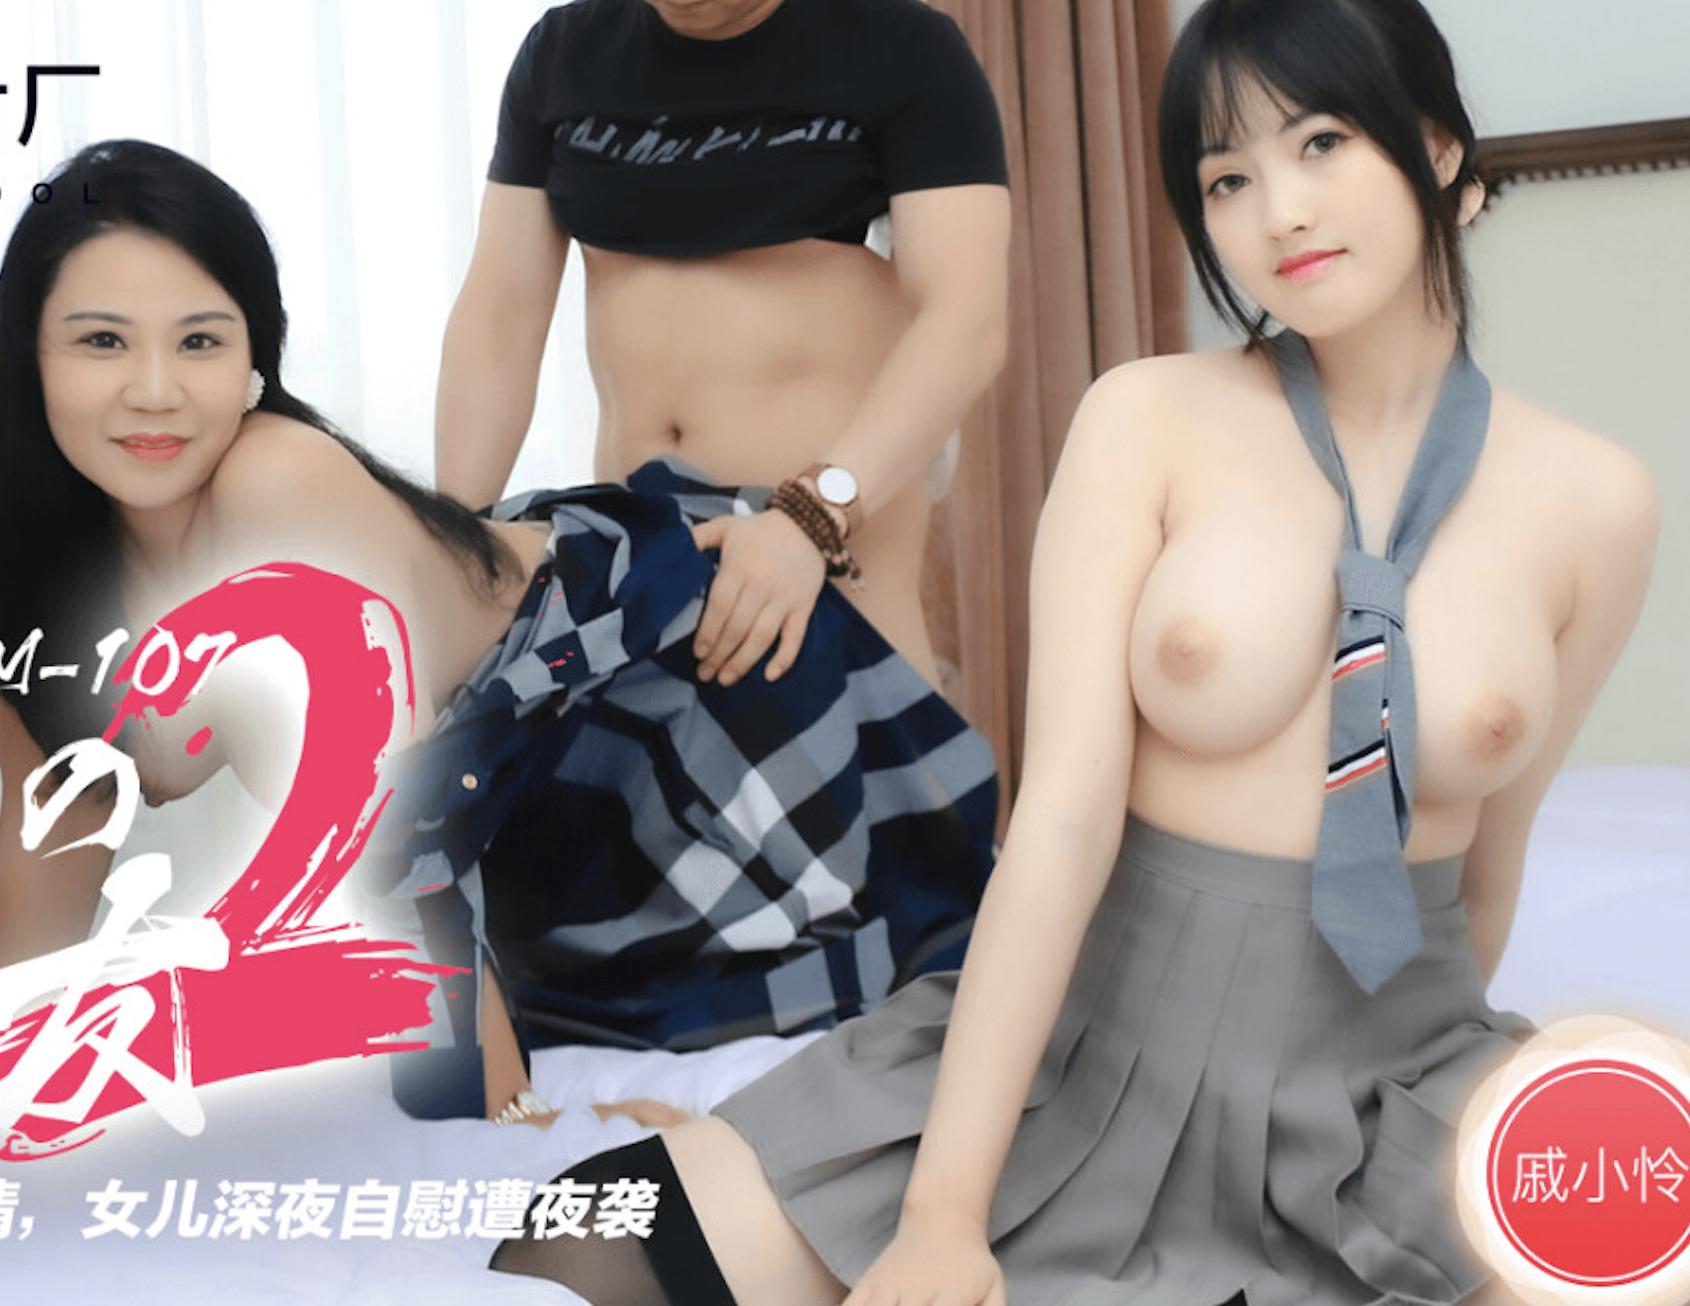 台湾AV-母娘丼 母の彼氏と娘 巨乳女子●生SEX J●